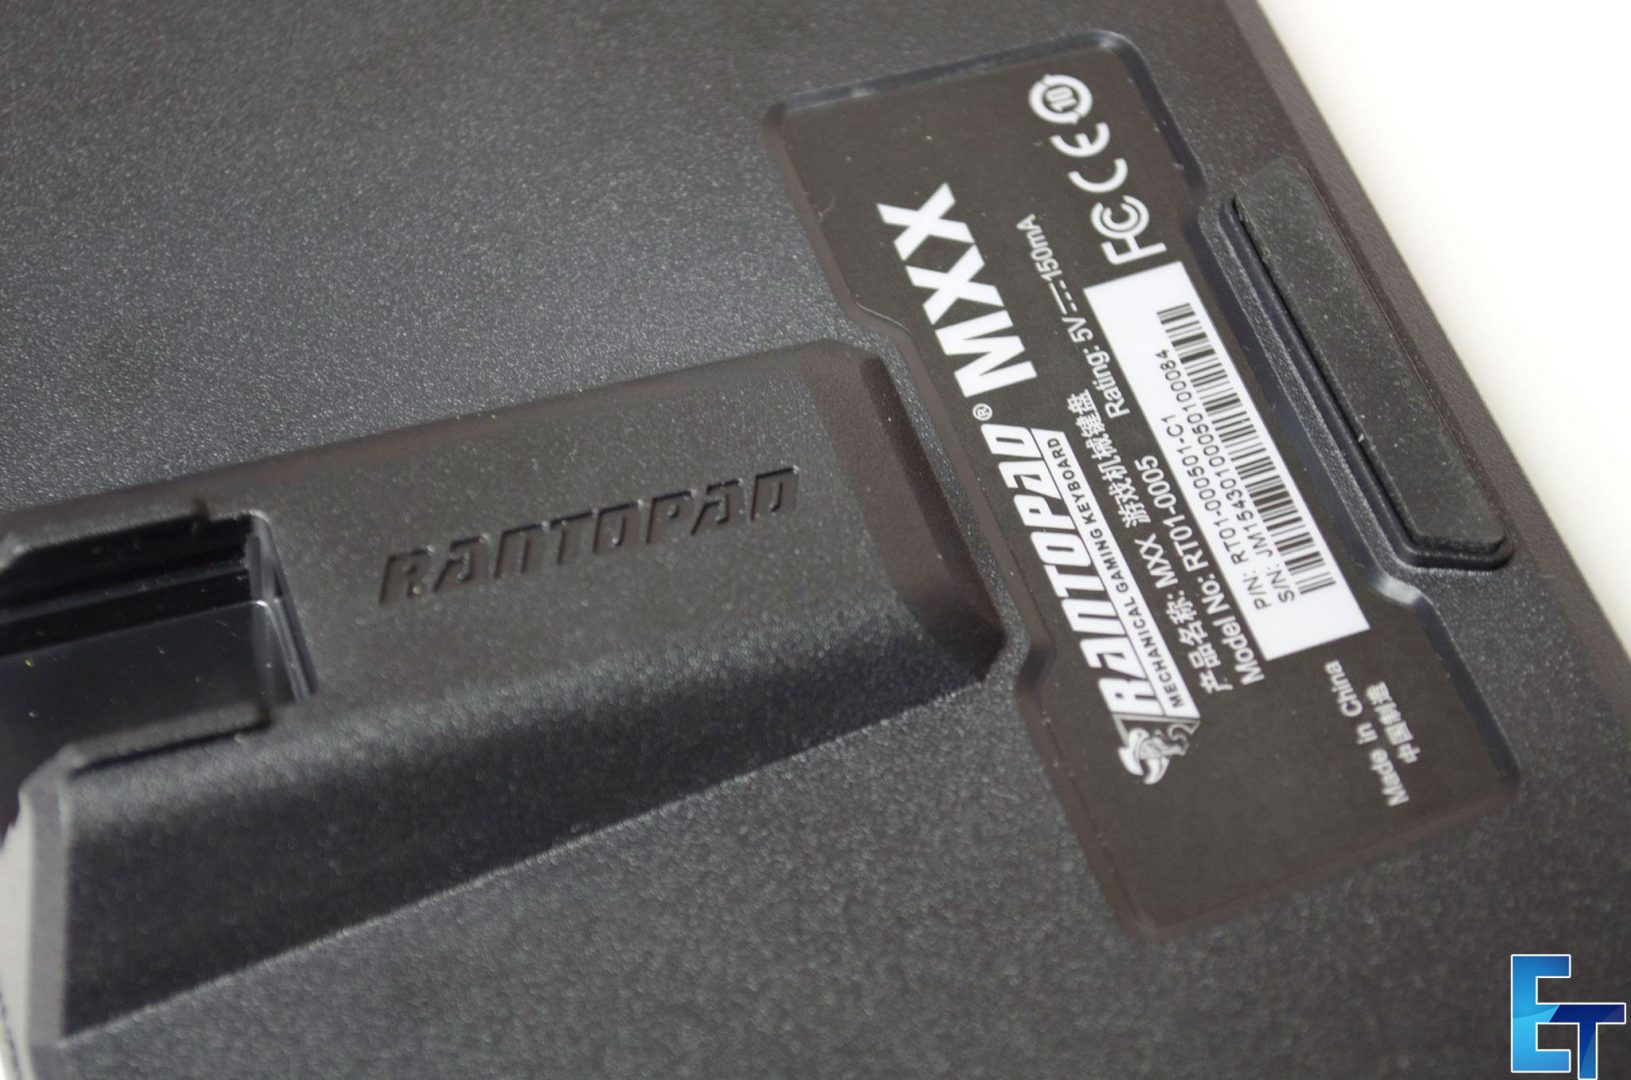 Rantopad-MXX-Gaming-Mechanical-Keyboard_14